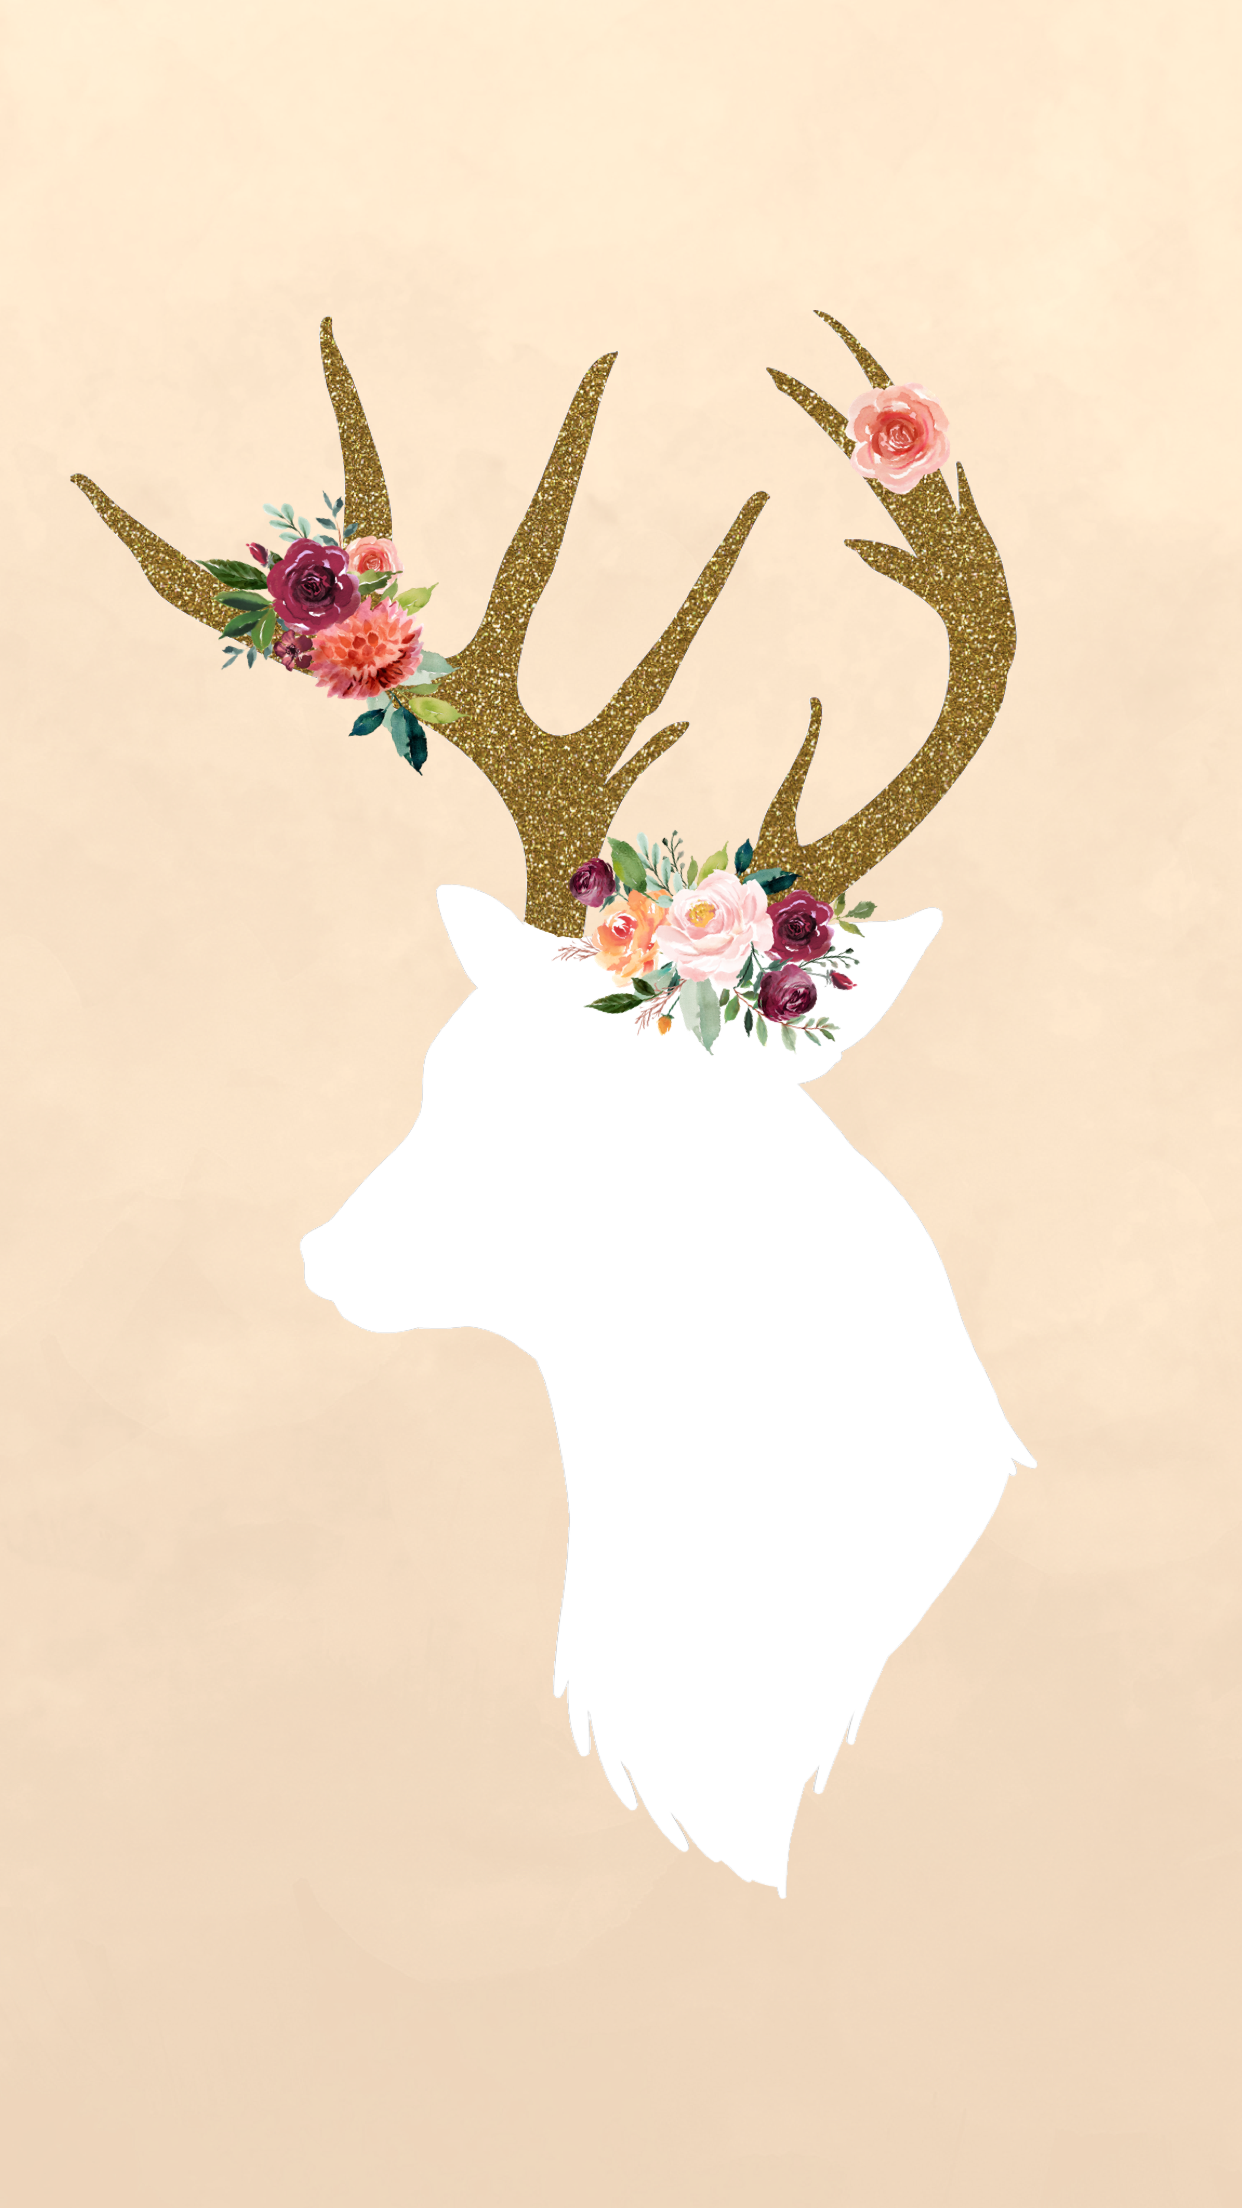 Cute Deer Wallpapers - Wallpaper Cave